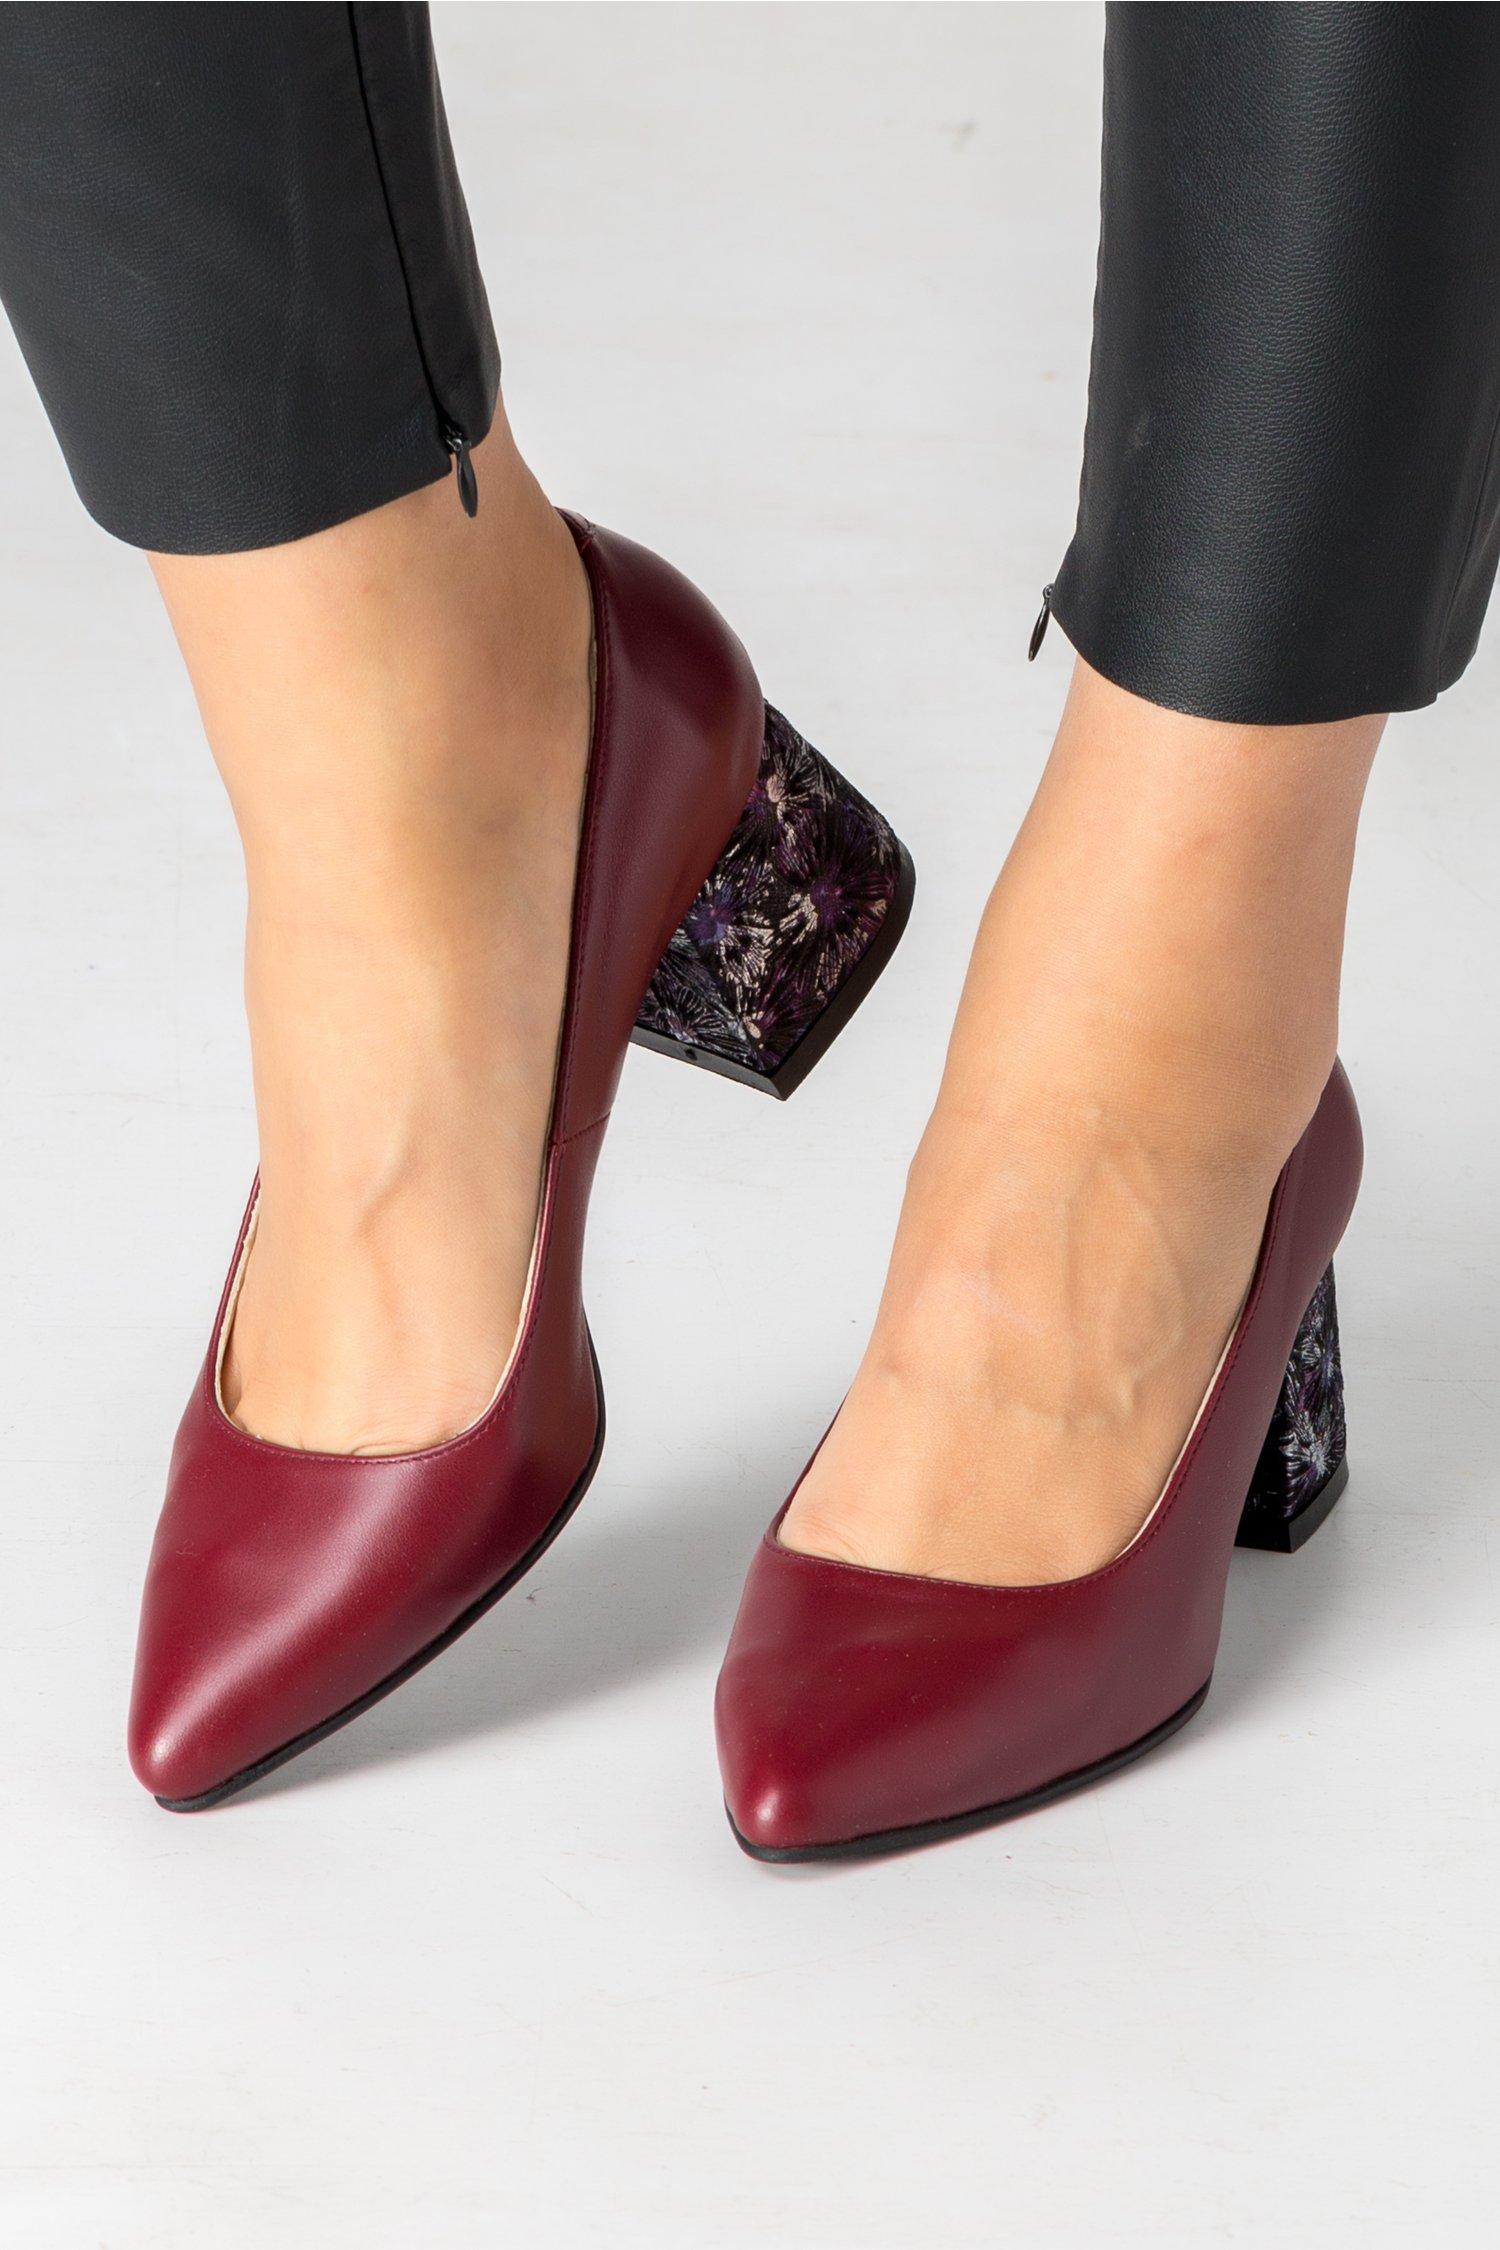 Pantofi grena cu toc jos si insertii florale